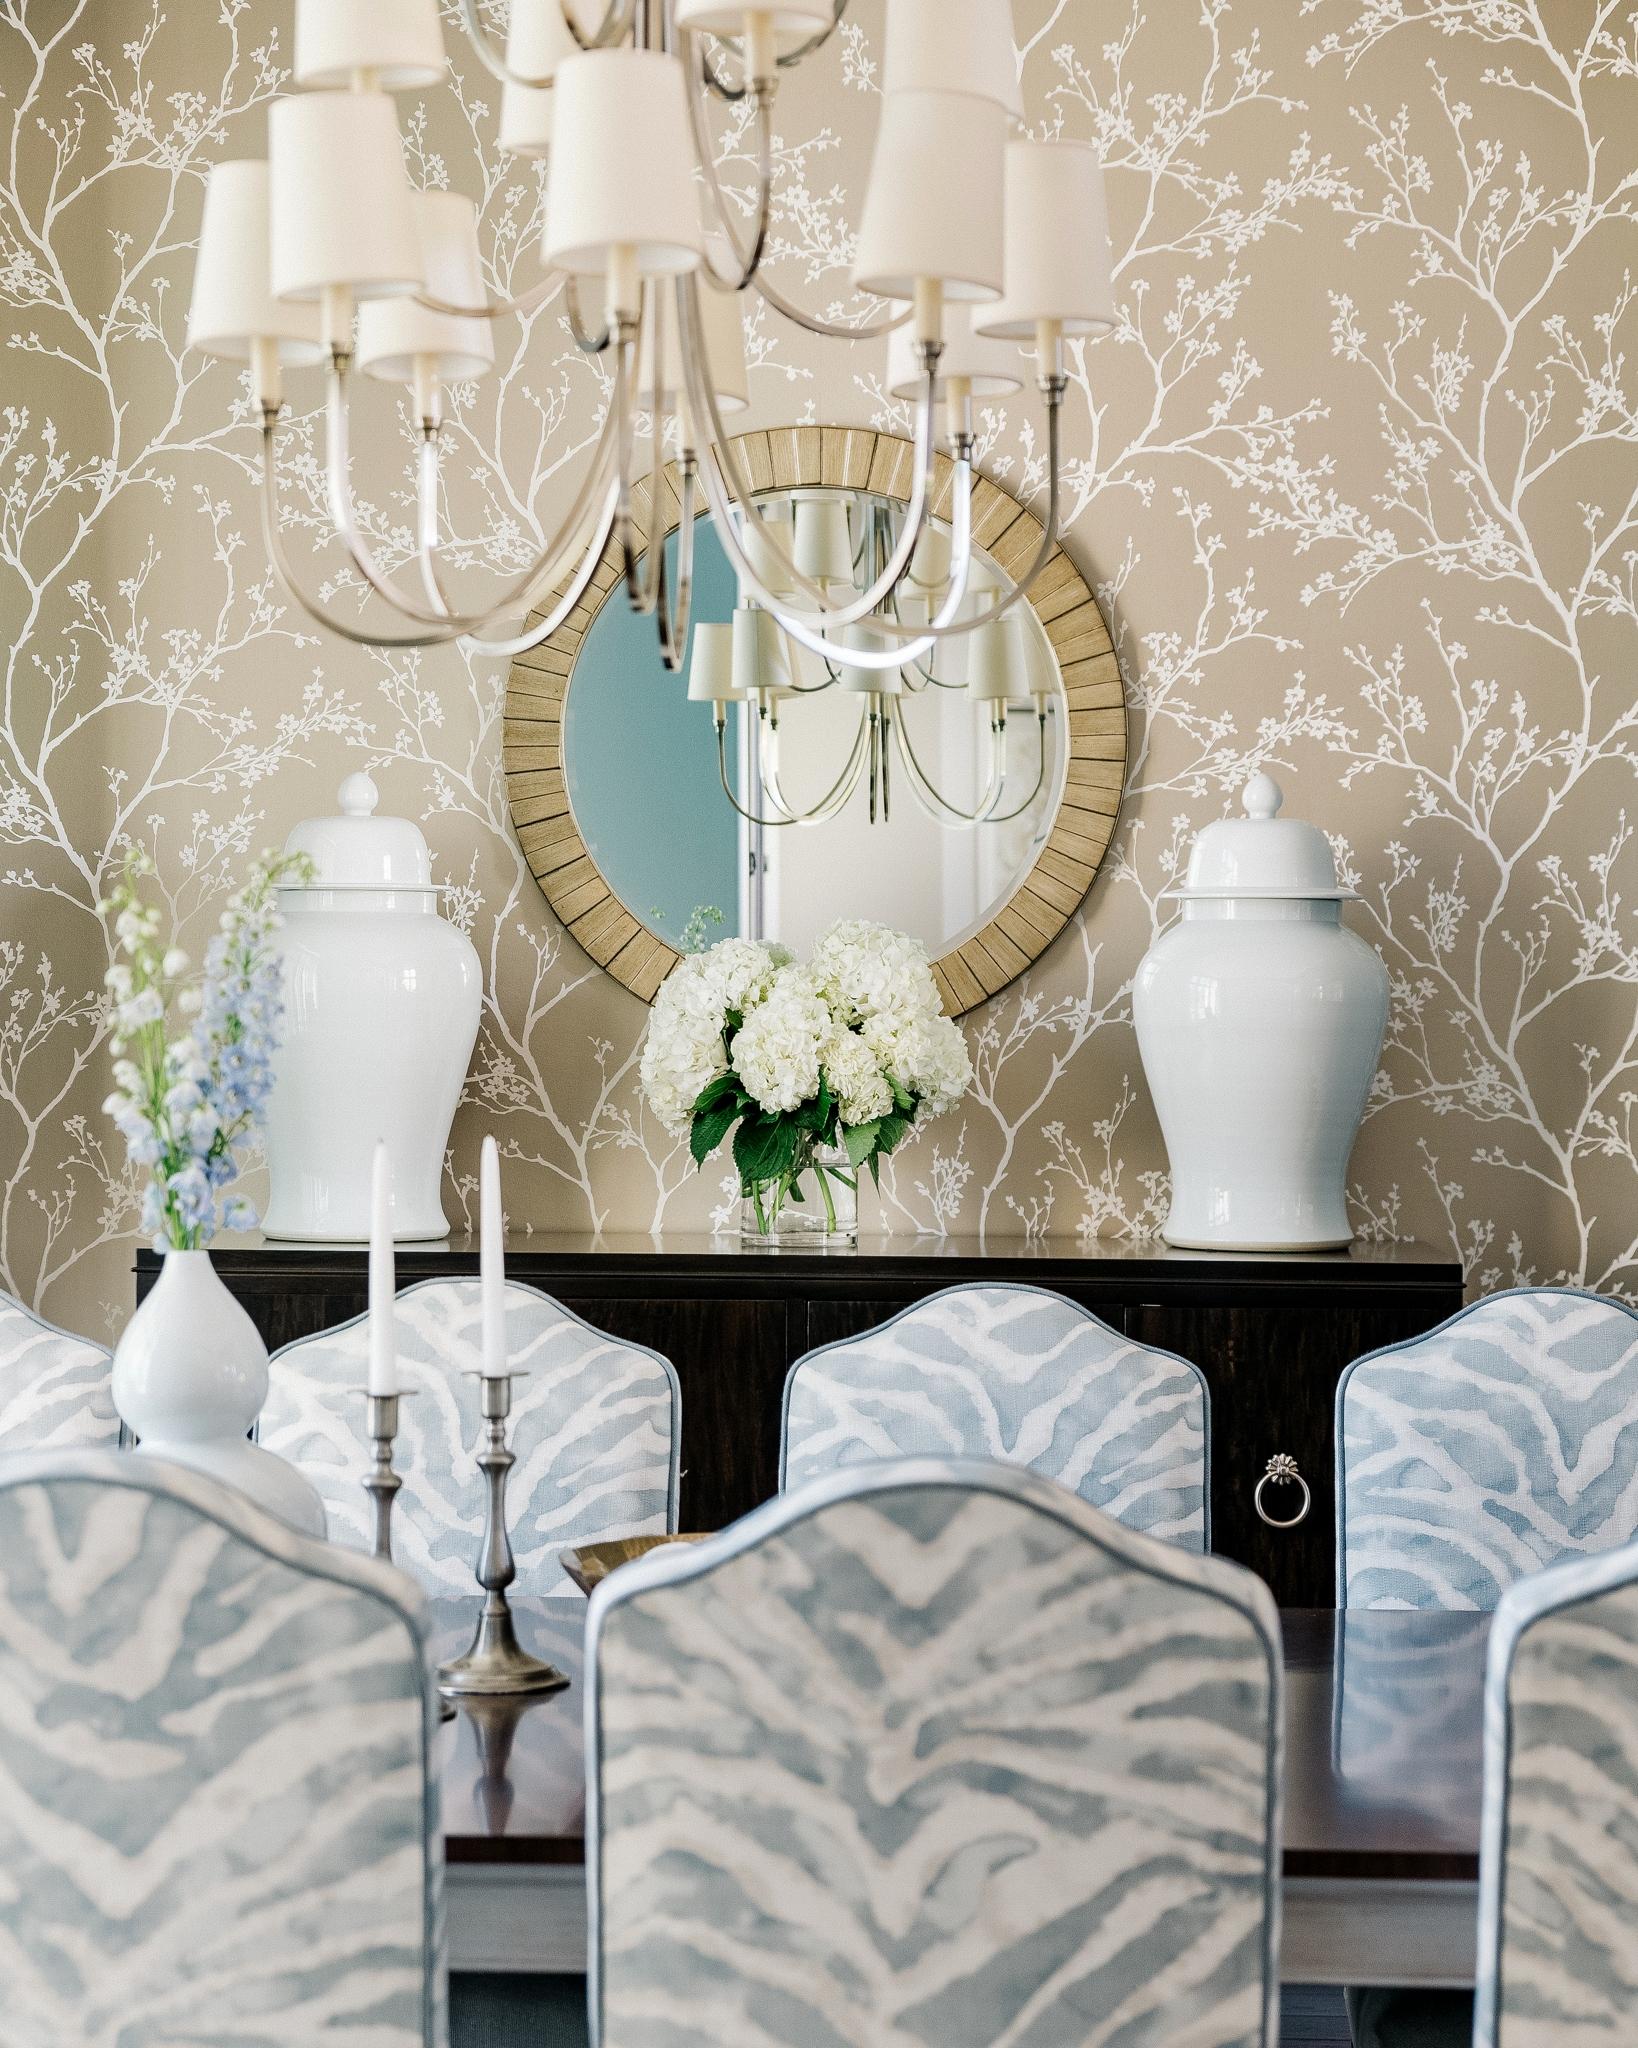 Elegant blue dining room   Carla Aston - Designer, Colleen Scott - Photographer #diningroomideas #diningroom #bluediningroom #zebrapattern